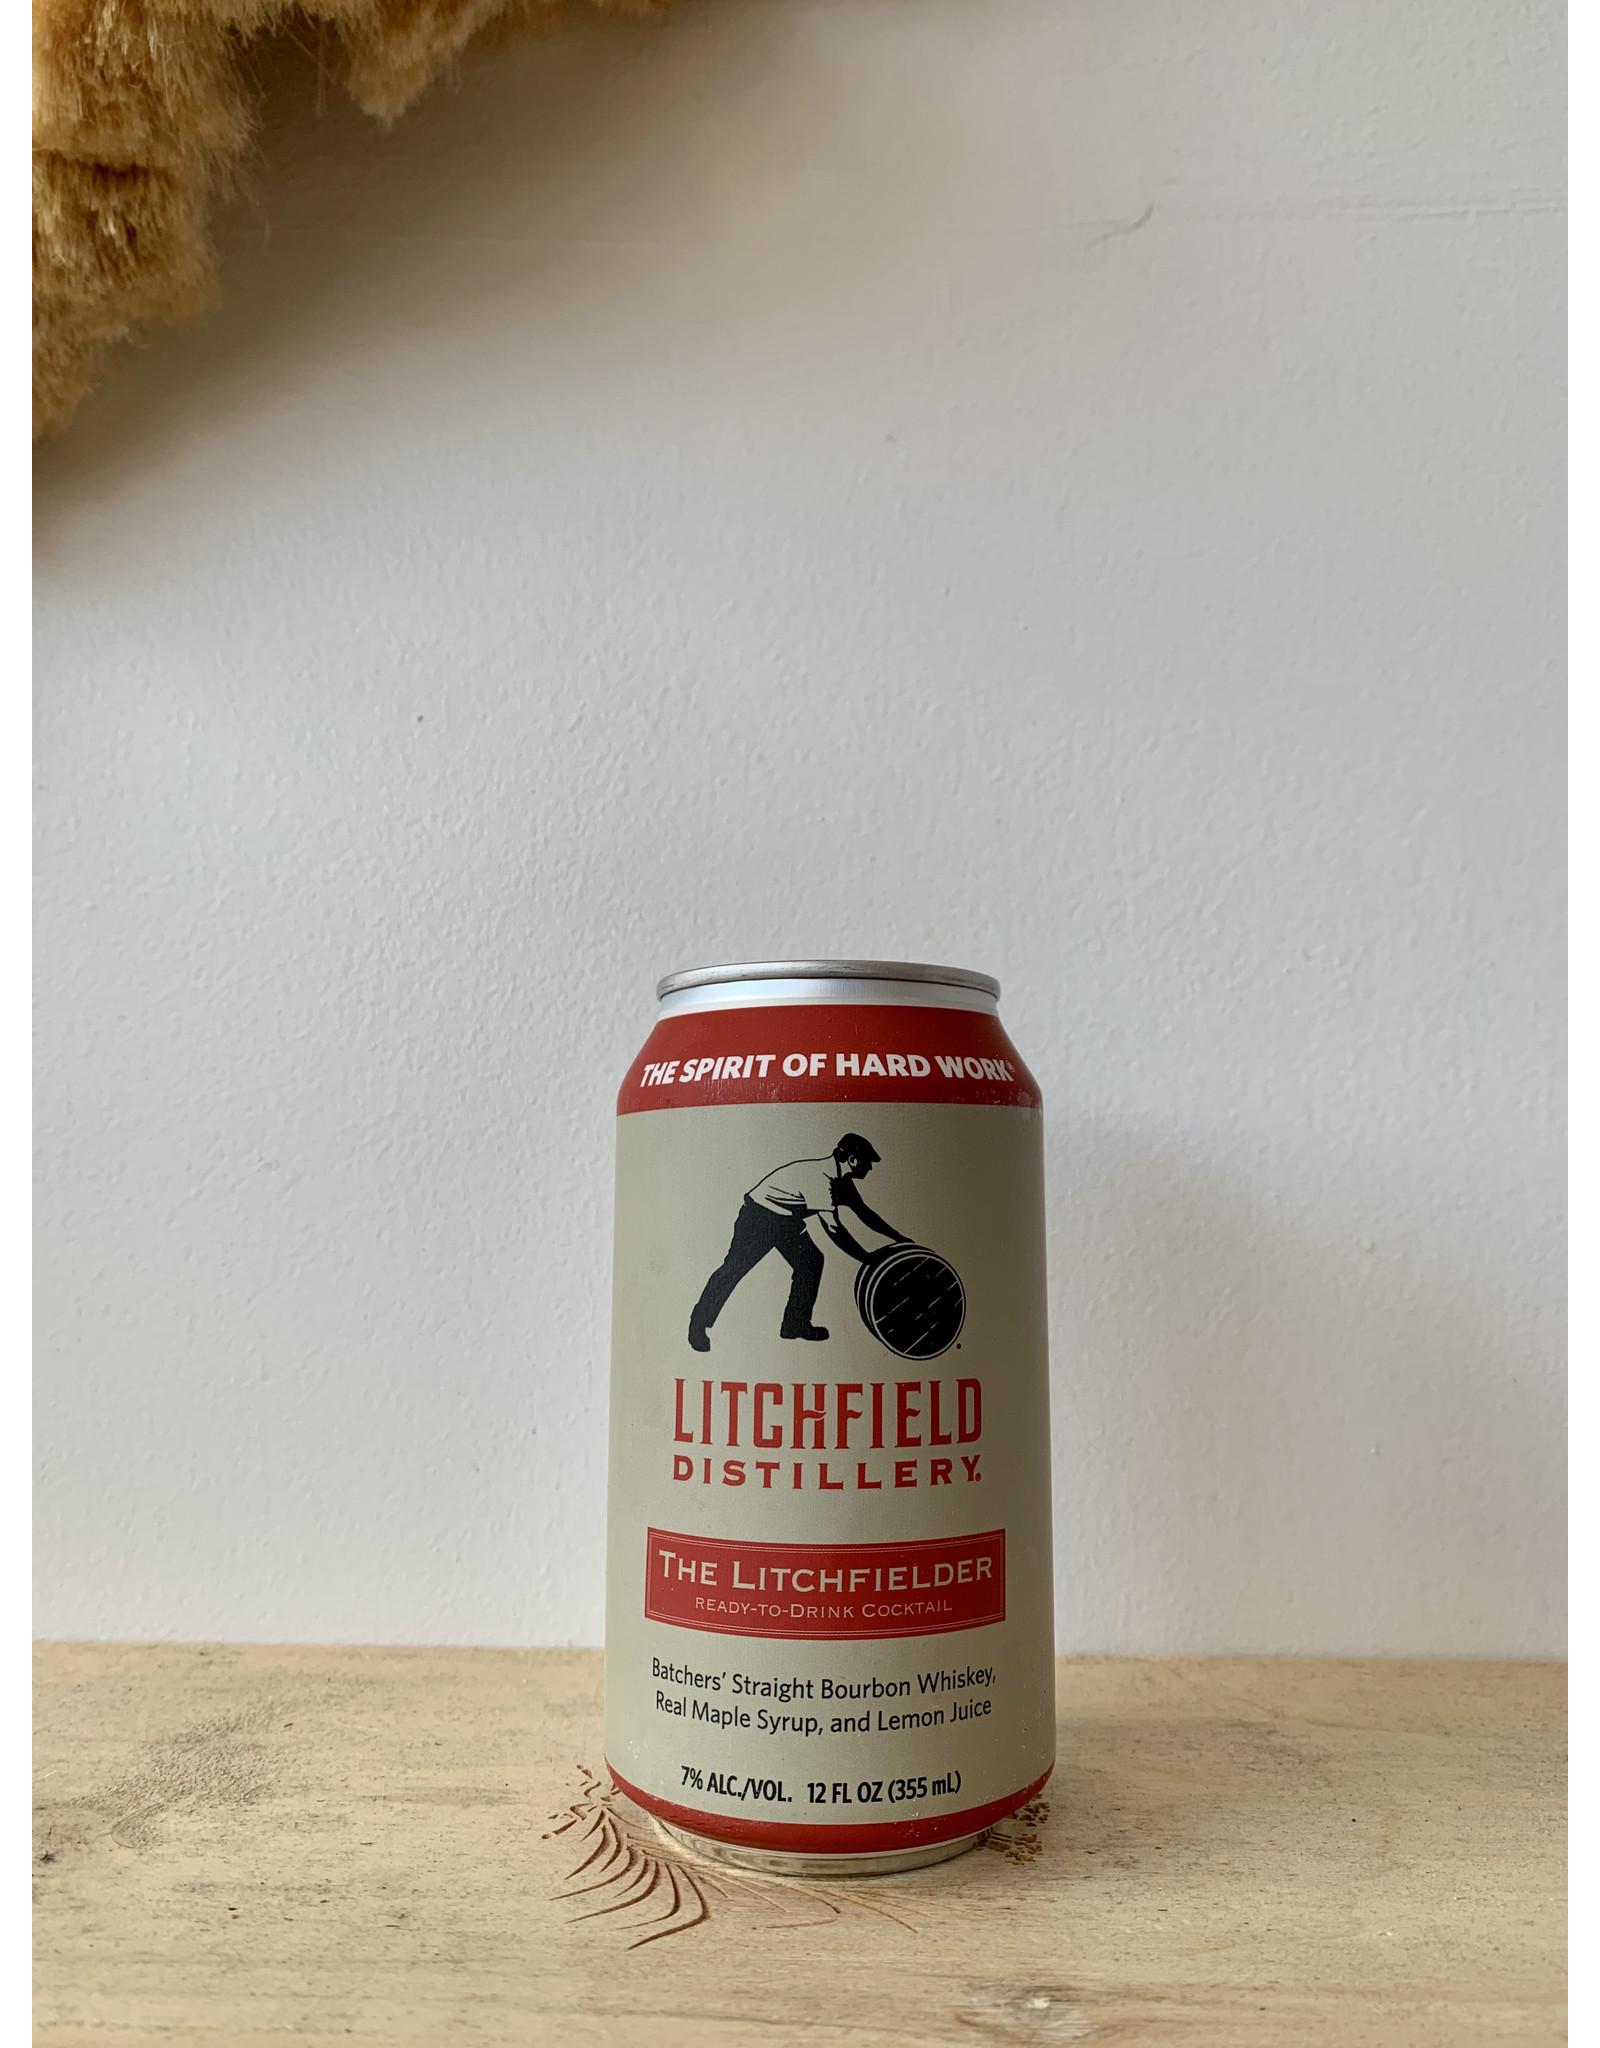 Litchfield Distillery The Litchfielder Can